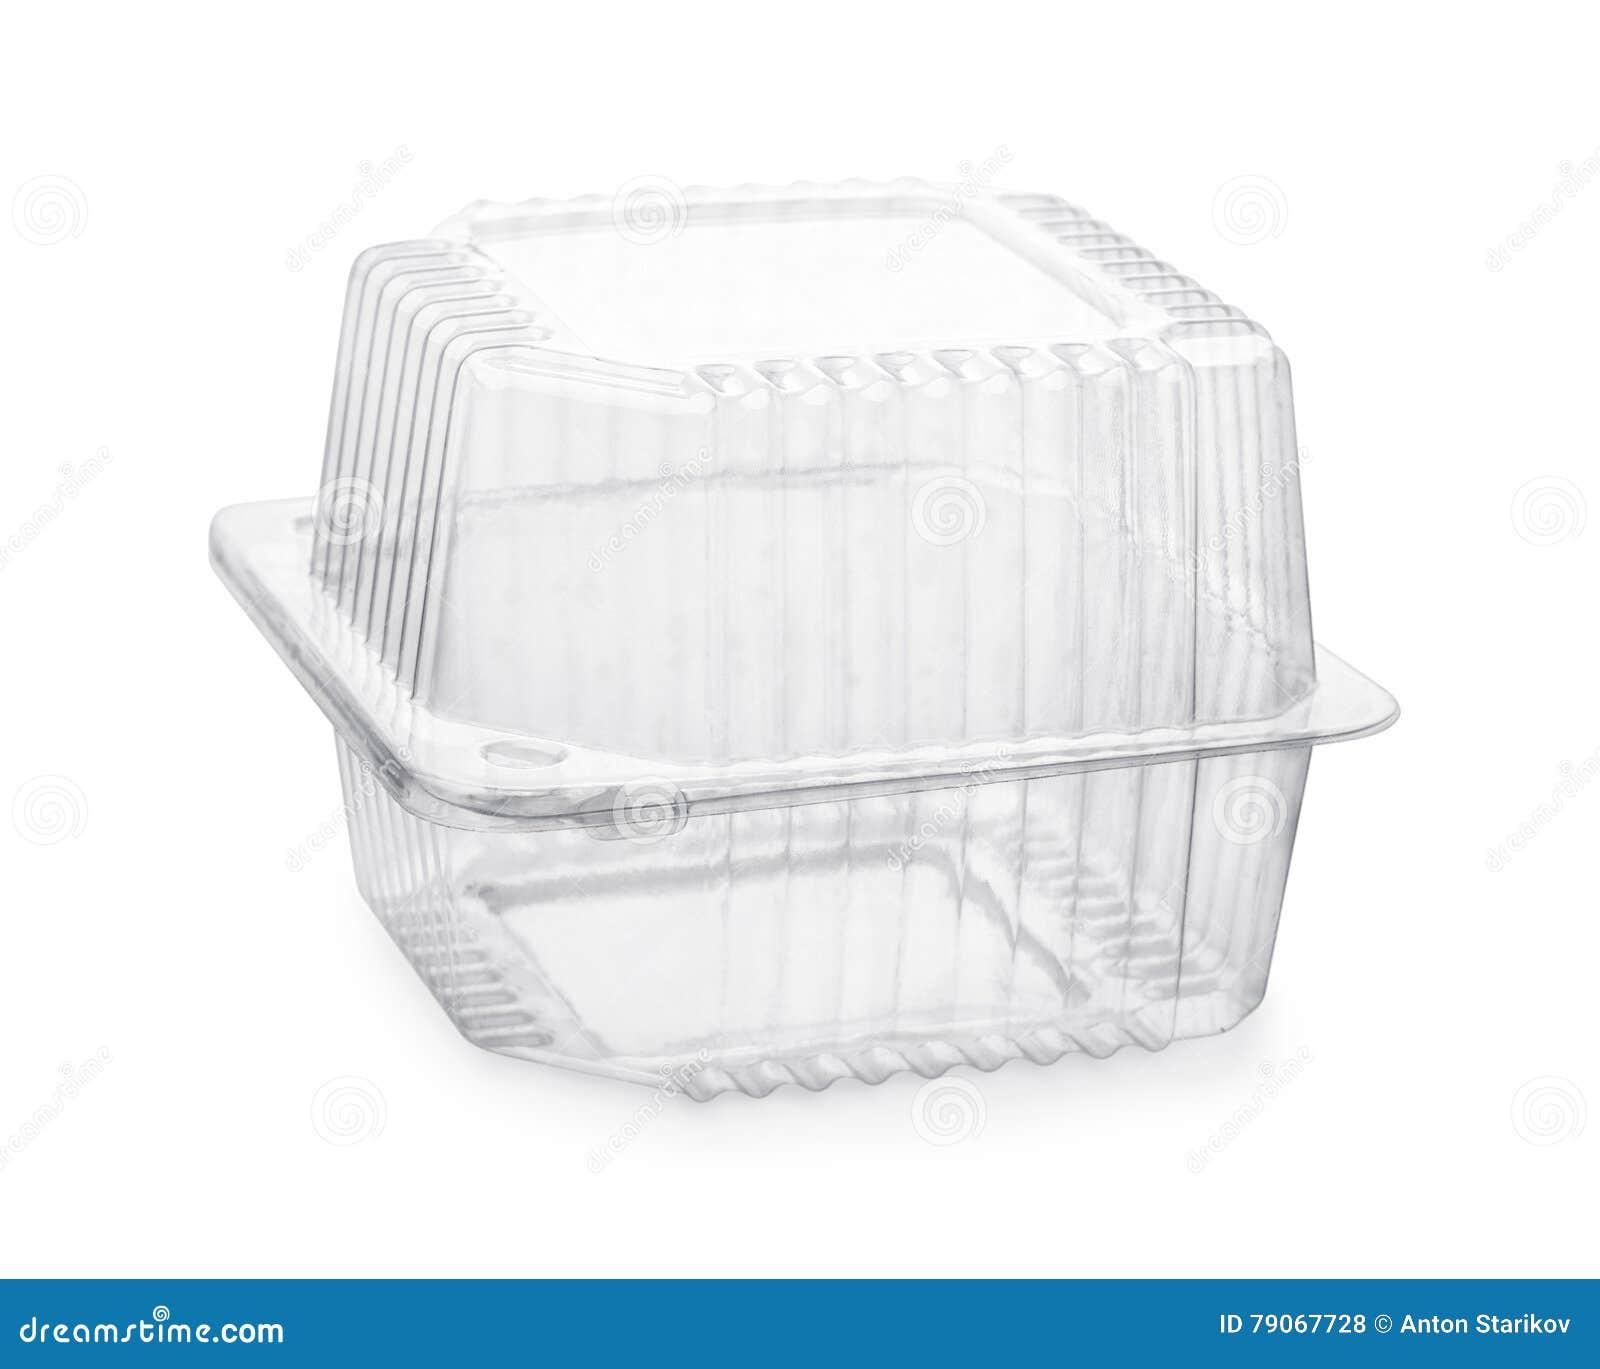 bo te en plastique transparente ferm e d 39 emballage. Black Bedroom Furniture Sets. Home Design Ideas